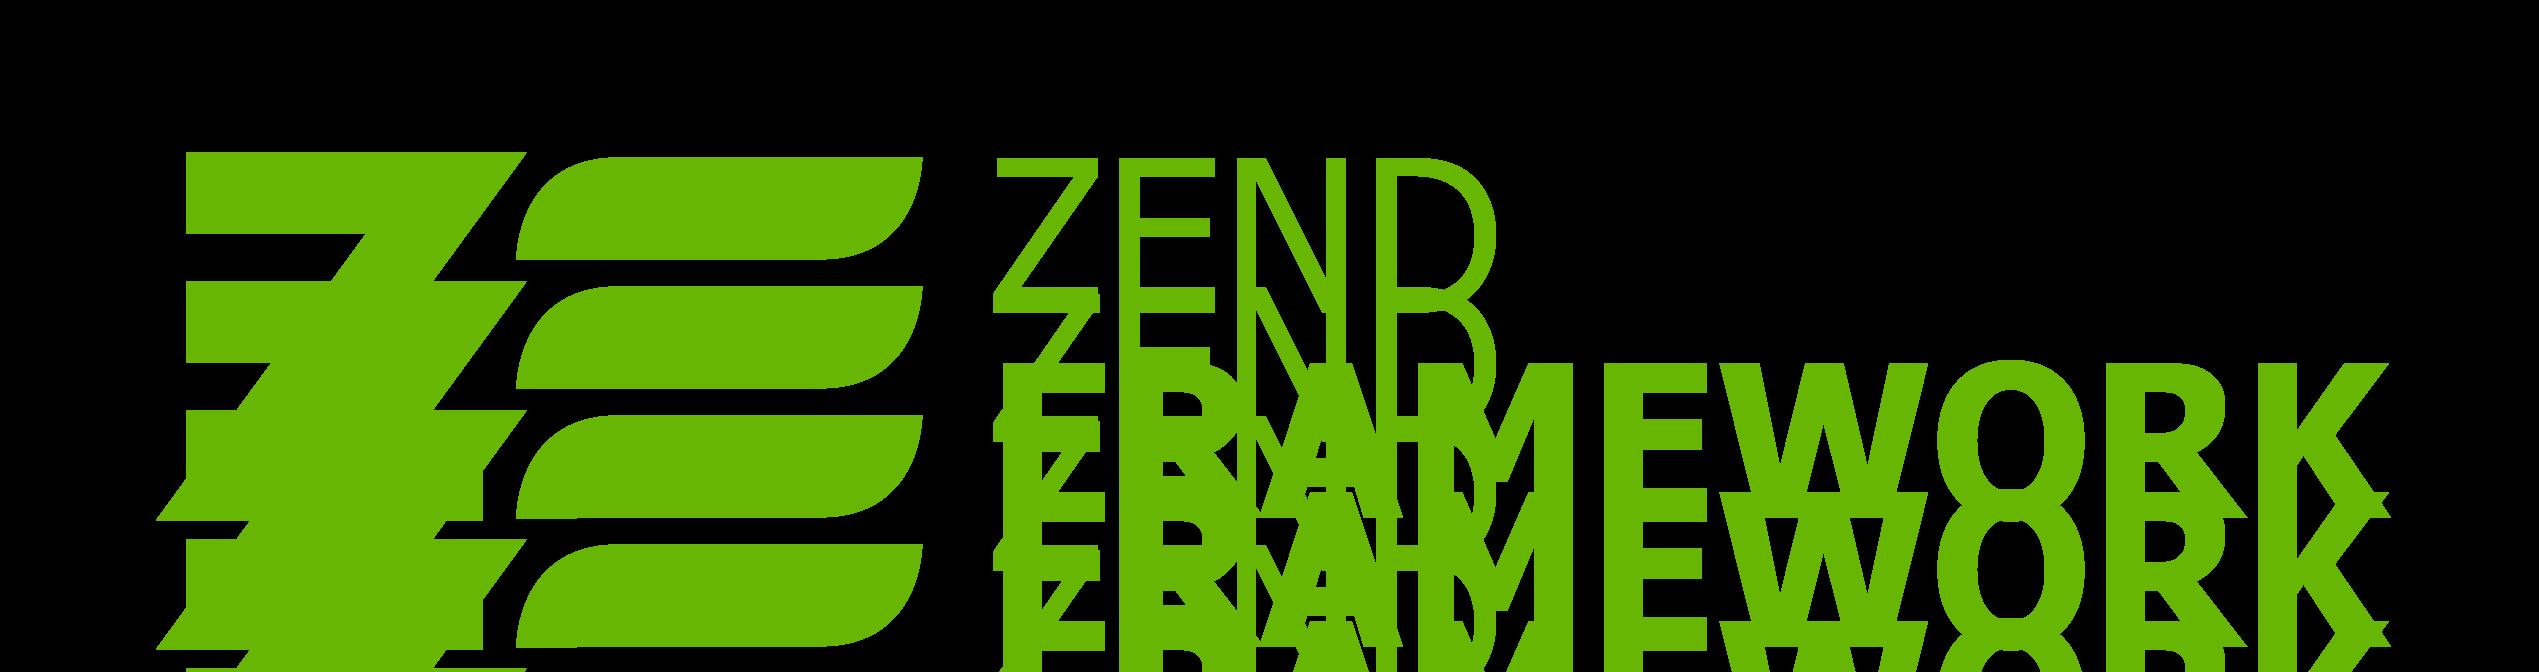 GitHub - zendframework/zf-web: Sources for the Zend Framework website